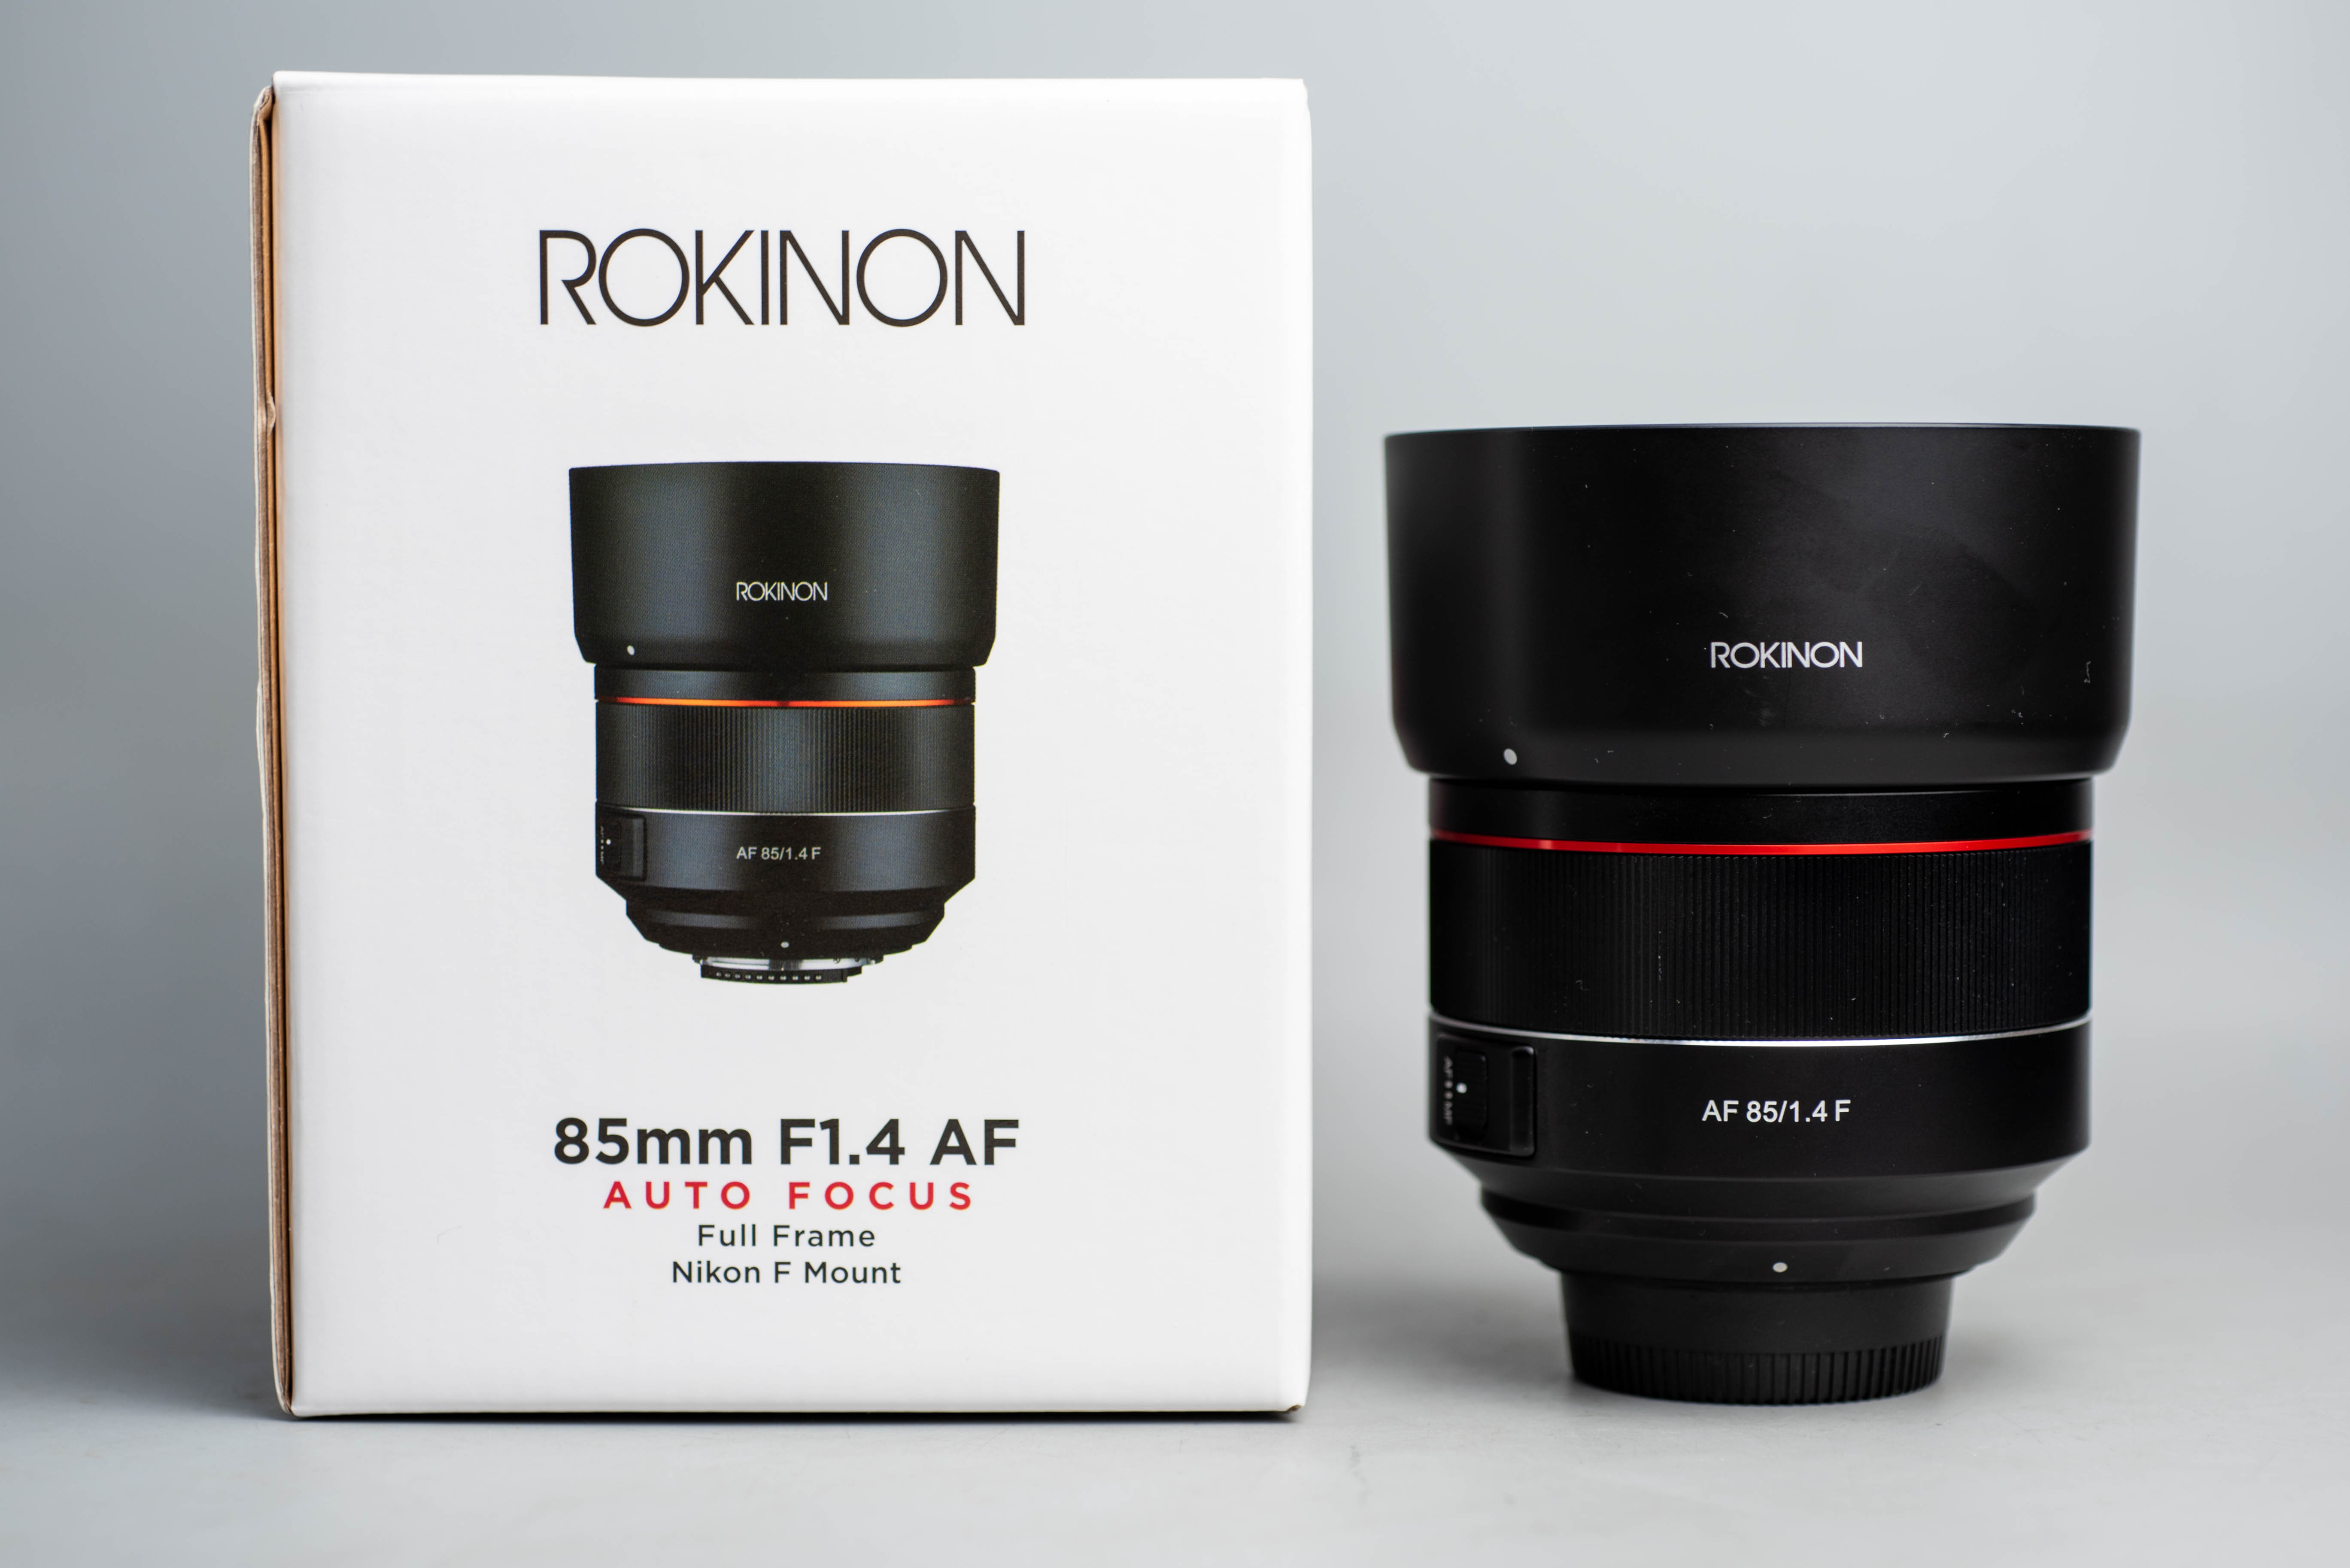 rokinon-samyang-85mm-f1-4-af-nikon-rokinon-85-1-4-18645